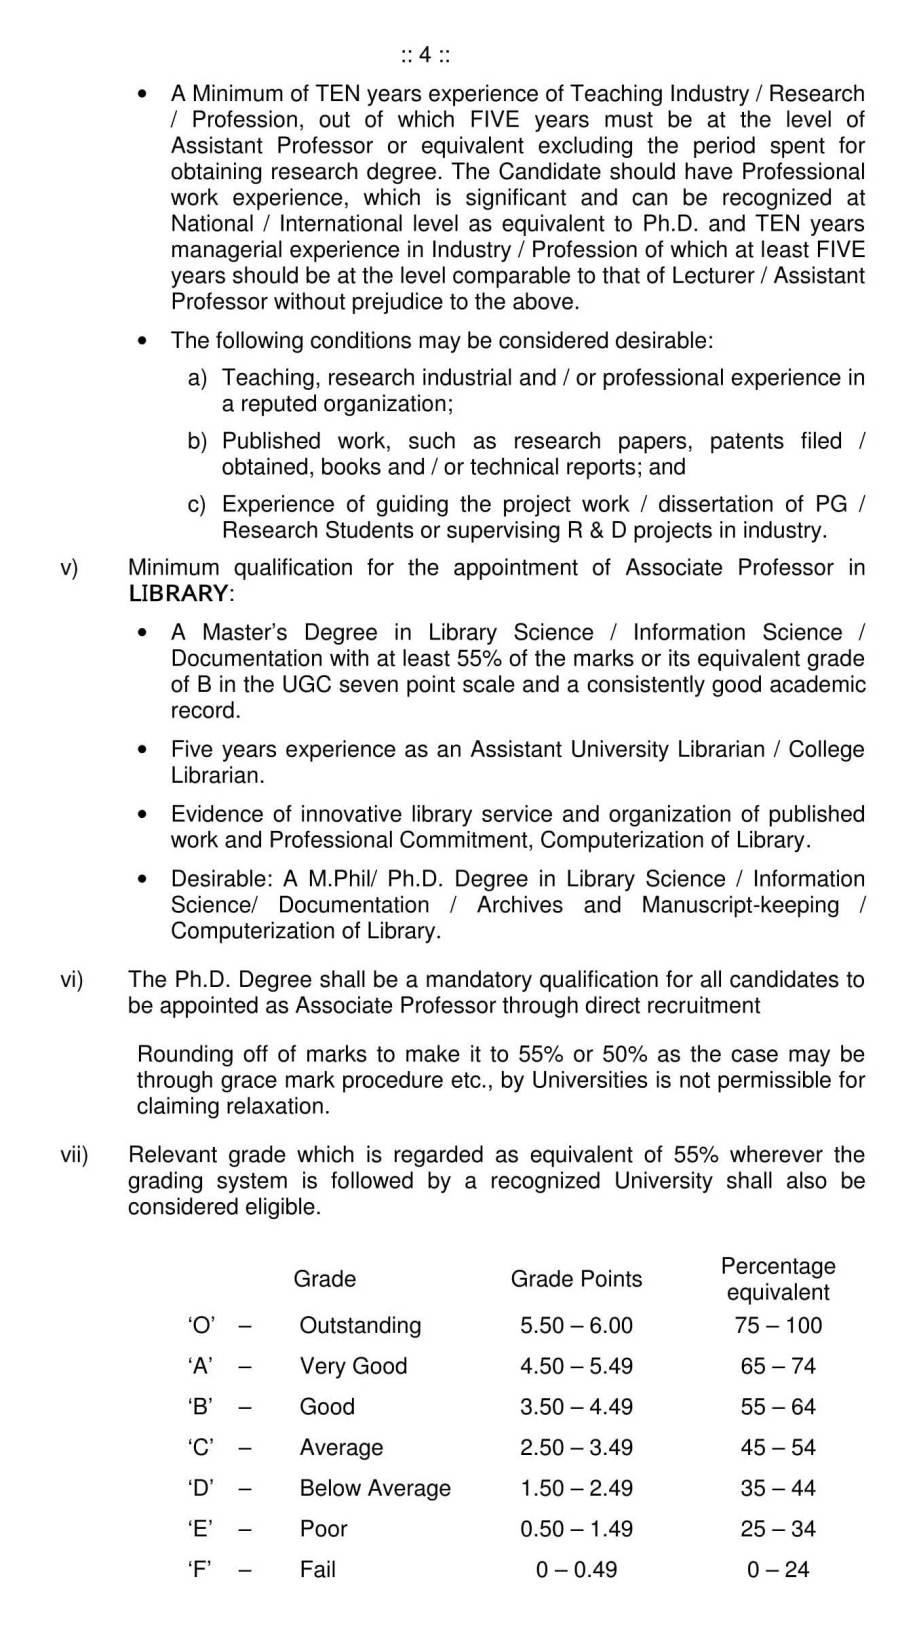 20171224111251515_Notification-for-recruitment-of-Associate-Professor-Posts-2017_3-4.jpg